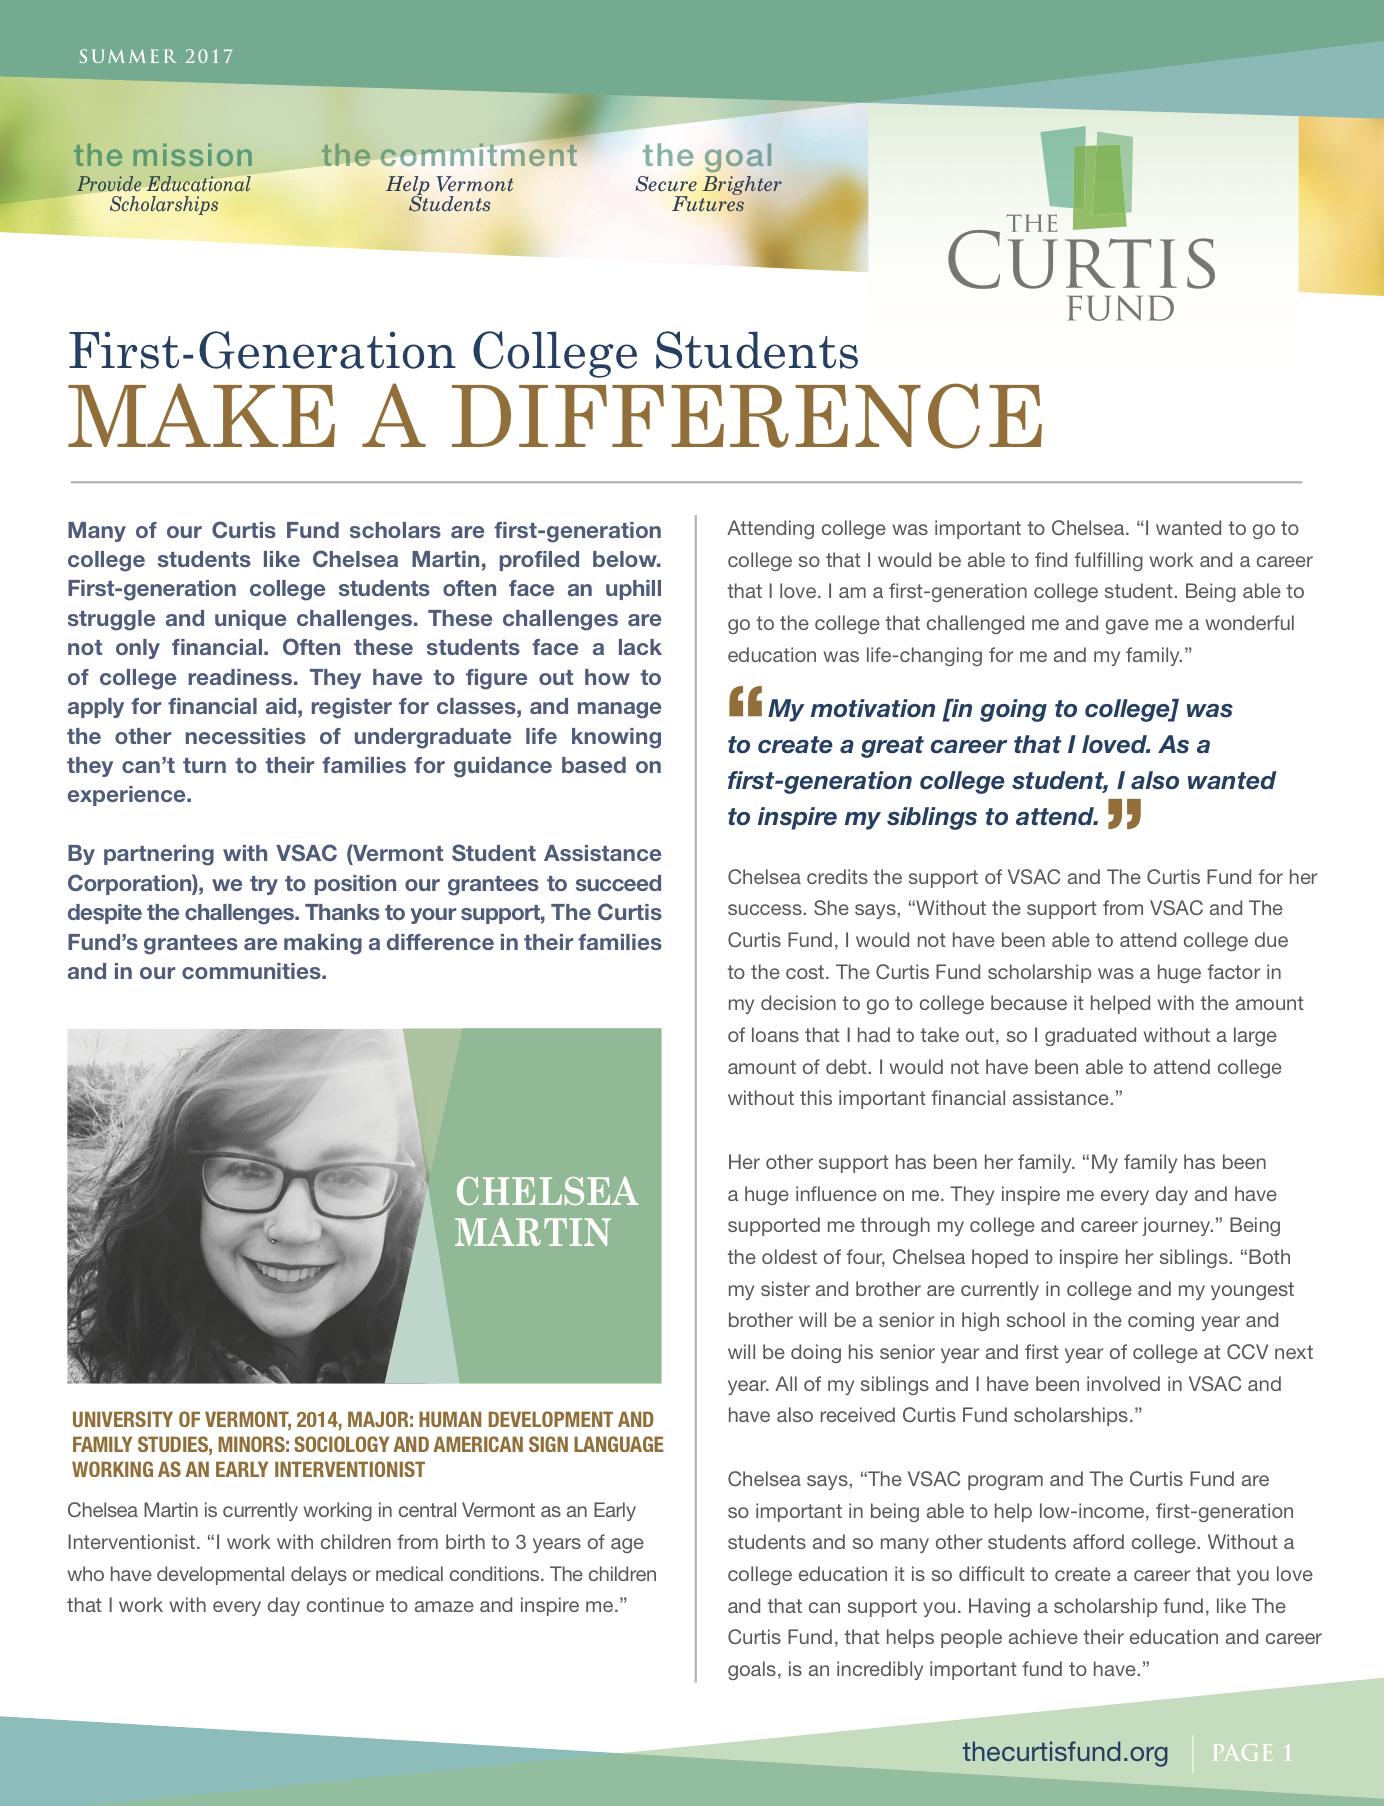 curtis fund summer 2017 newsletter cover